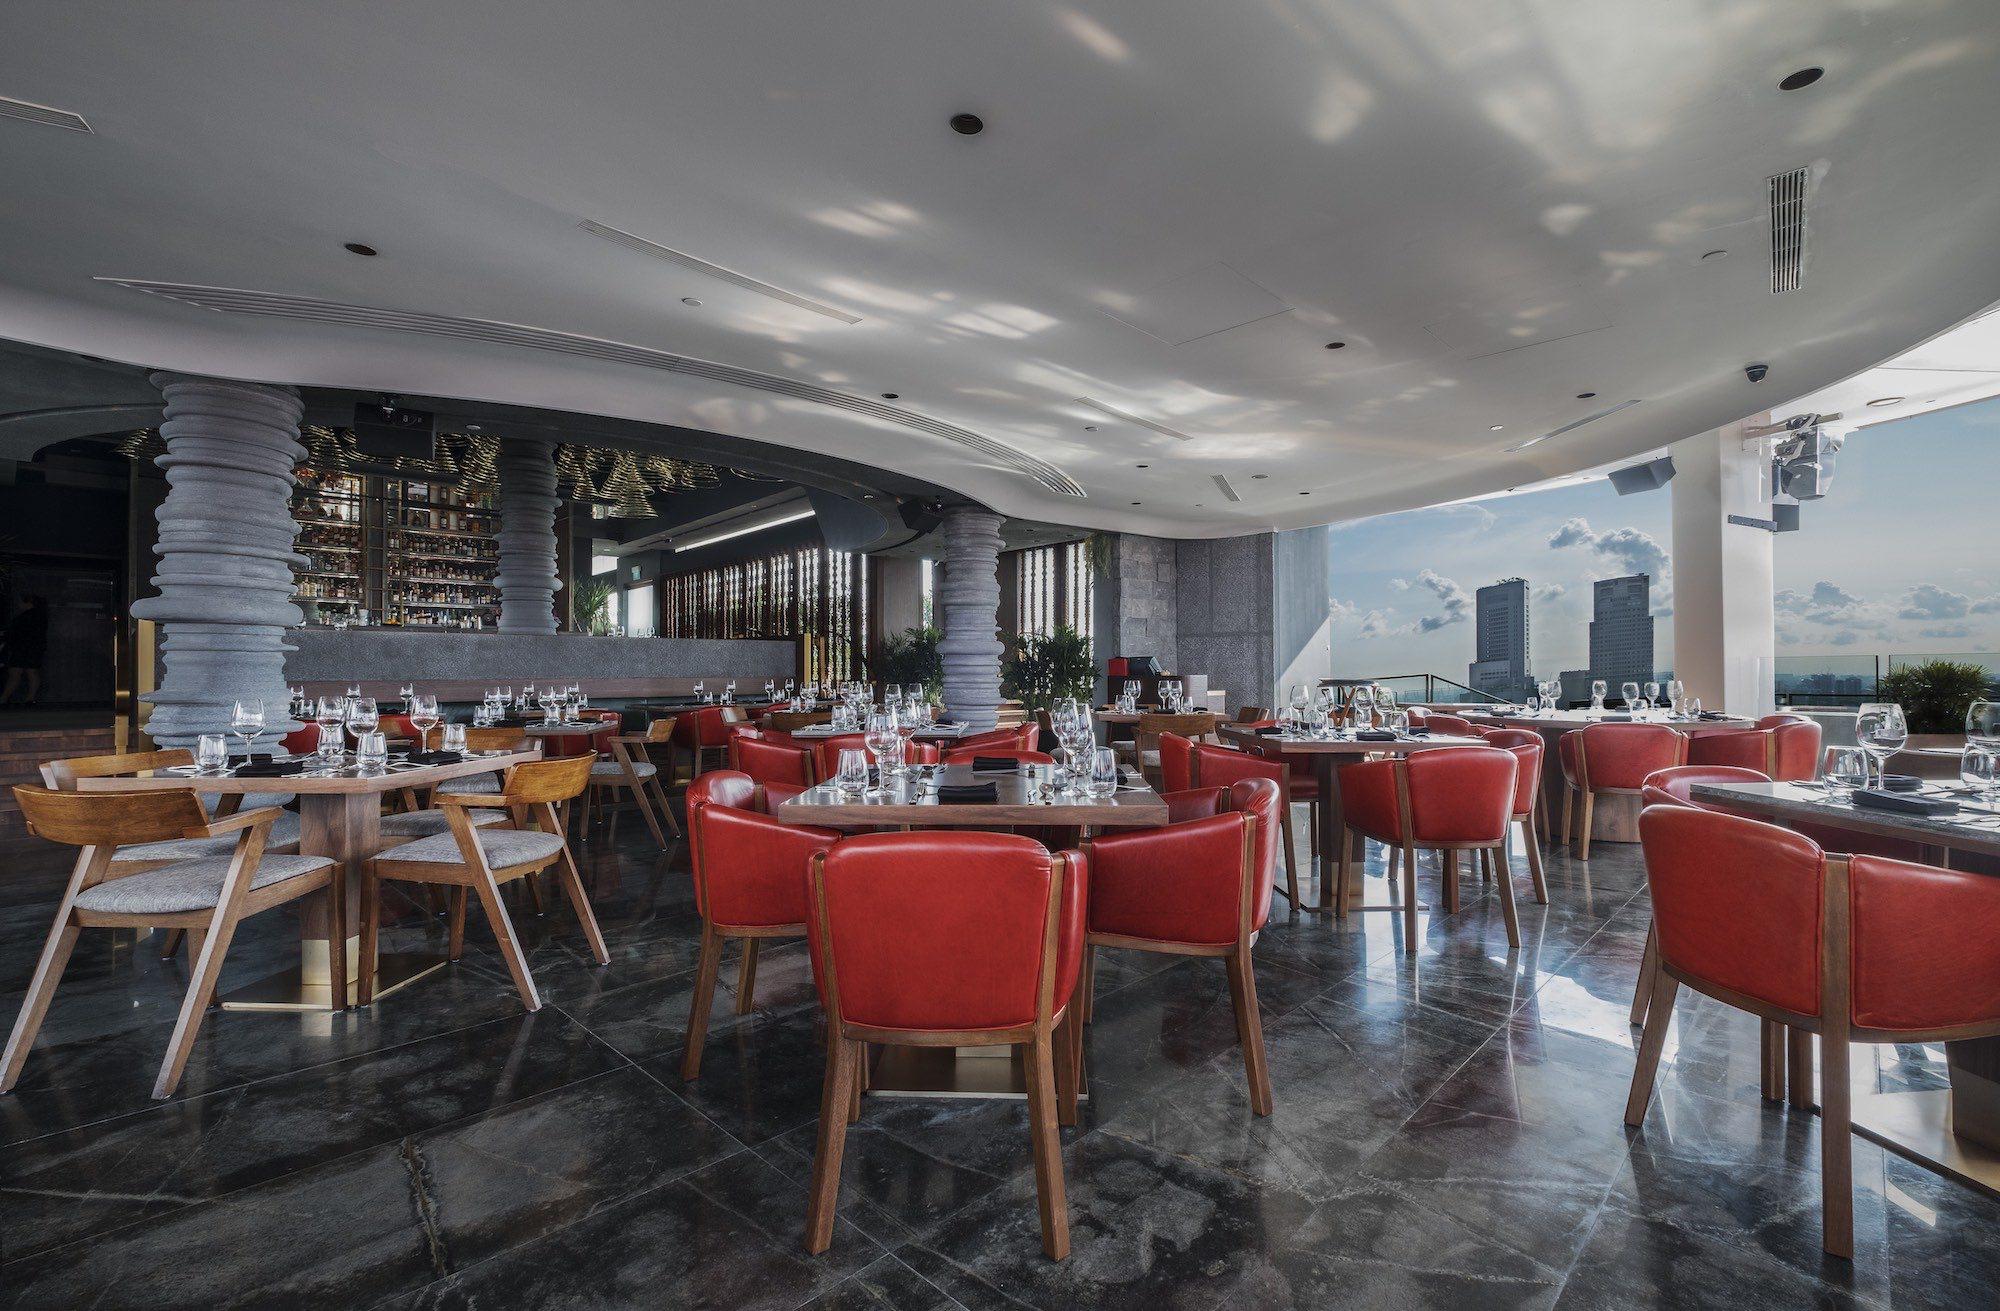 CE LA VI Restaurant Rooftop Bar Interiors Photography Singapore COCO Creative Studio 14-copy